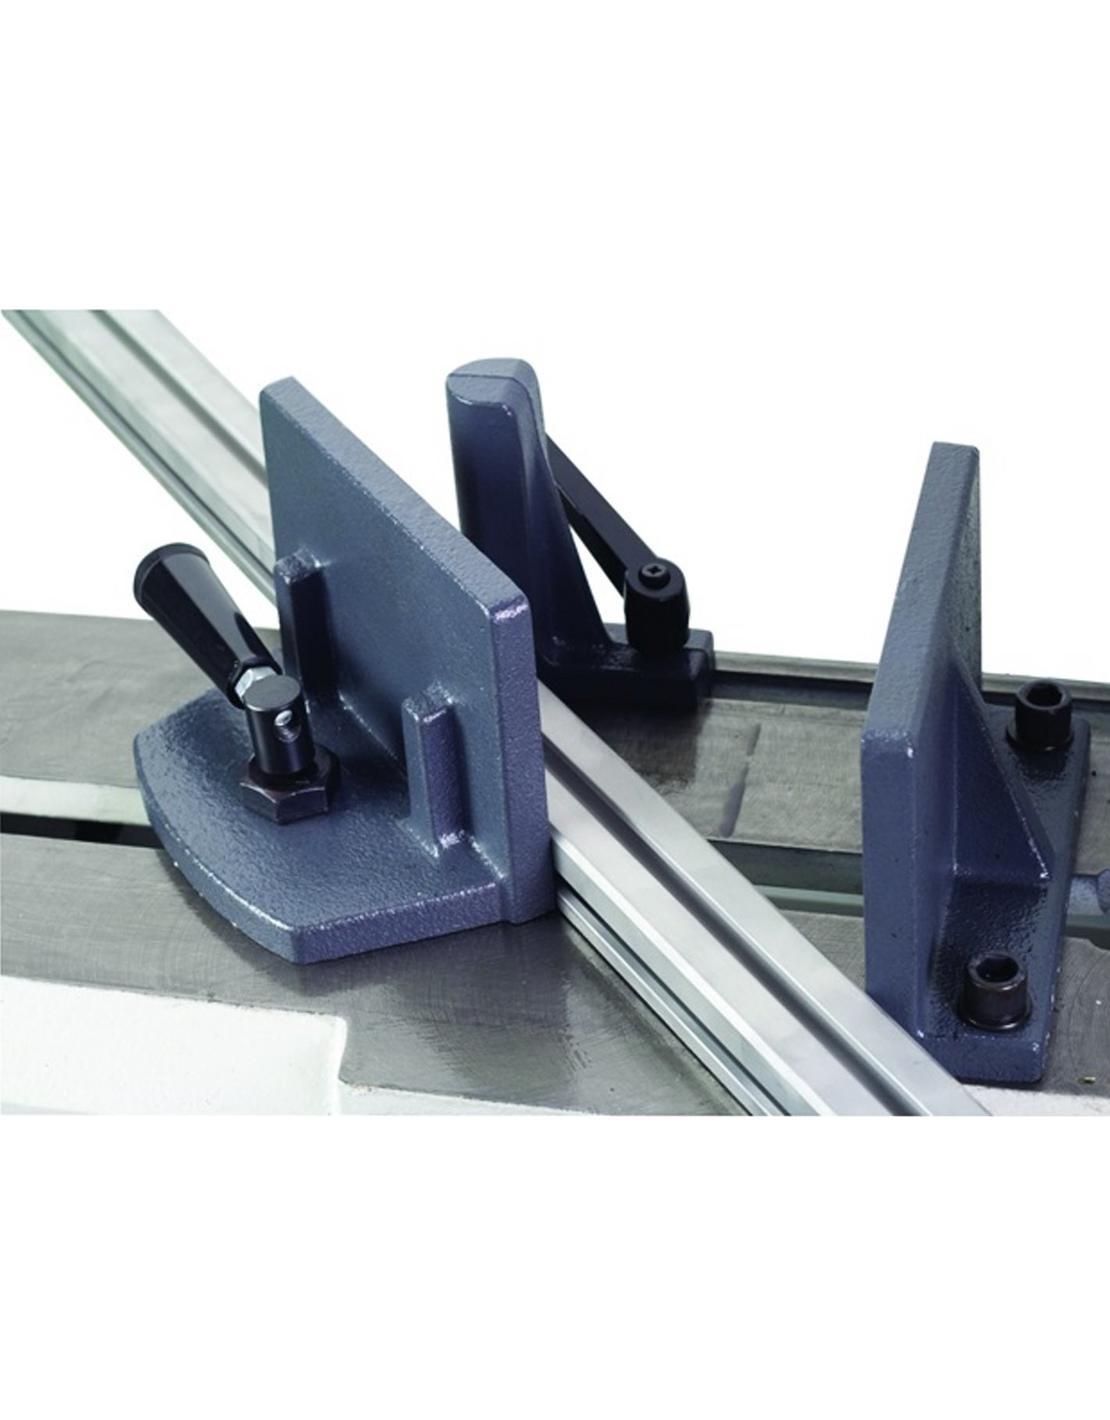 Rigid Pipe Cutting Wheels Ridgid Model F 514 Pipe Cutter